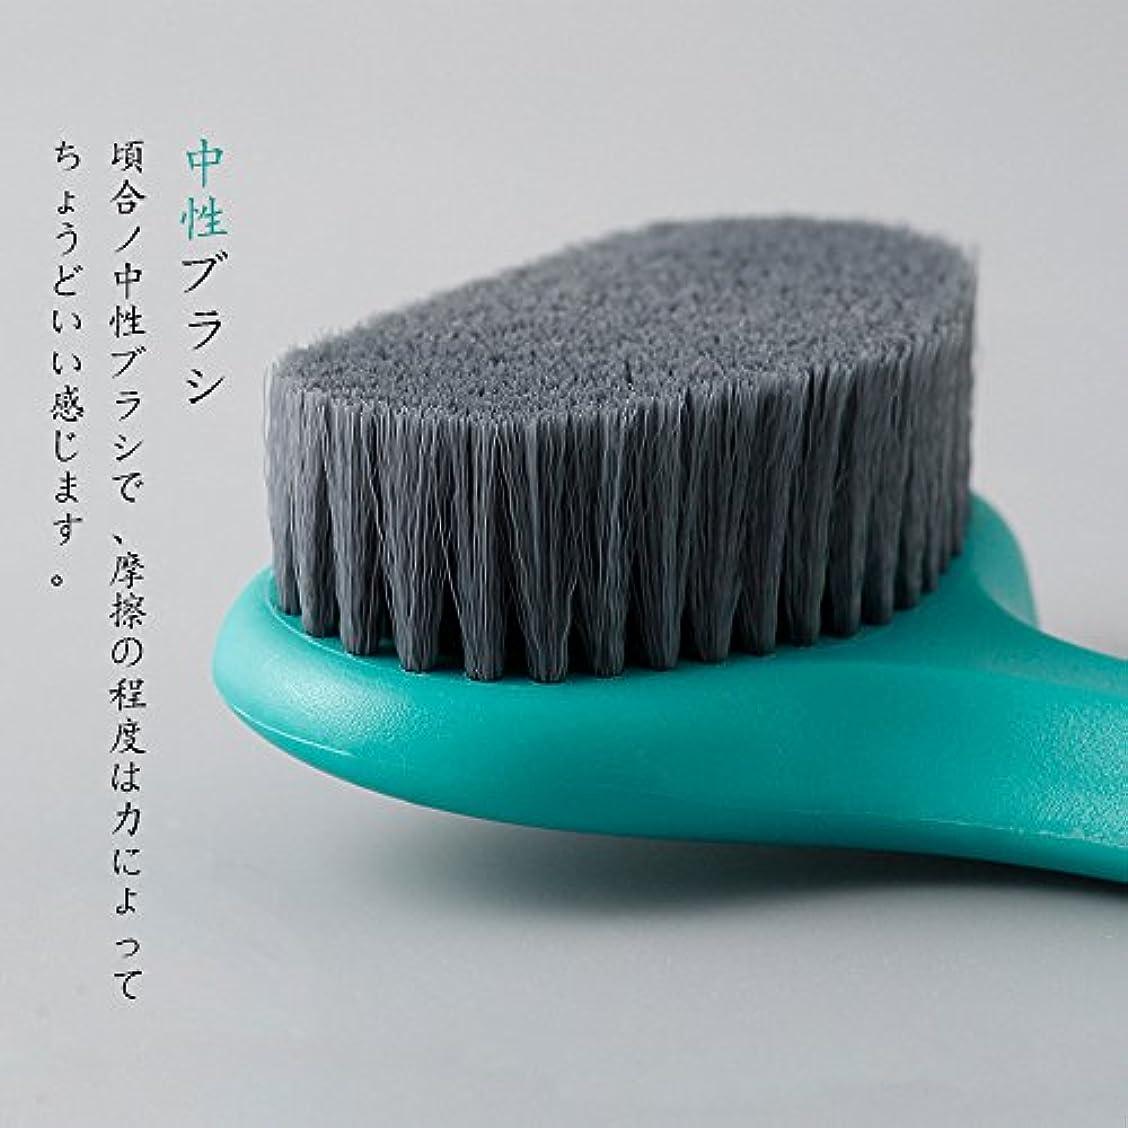 XVOOX あかすり ボディブラシ 体洗いブラシ 背中ニキビ お風呂用体洗い 角質除去/血行促進 バスグッズ ロング柄 (緑)